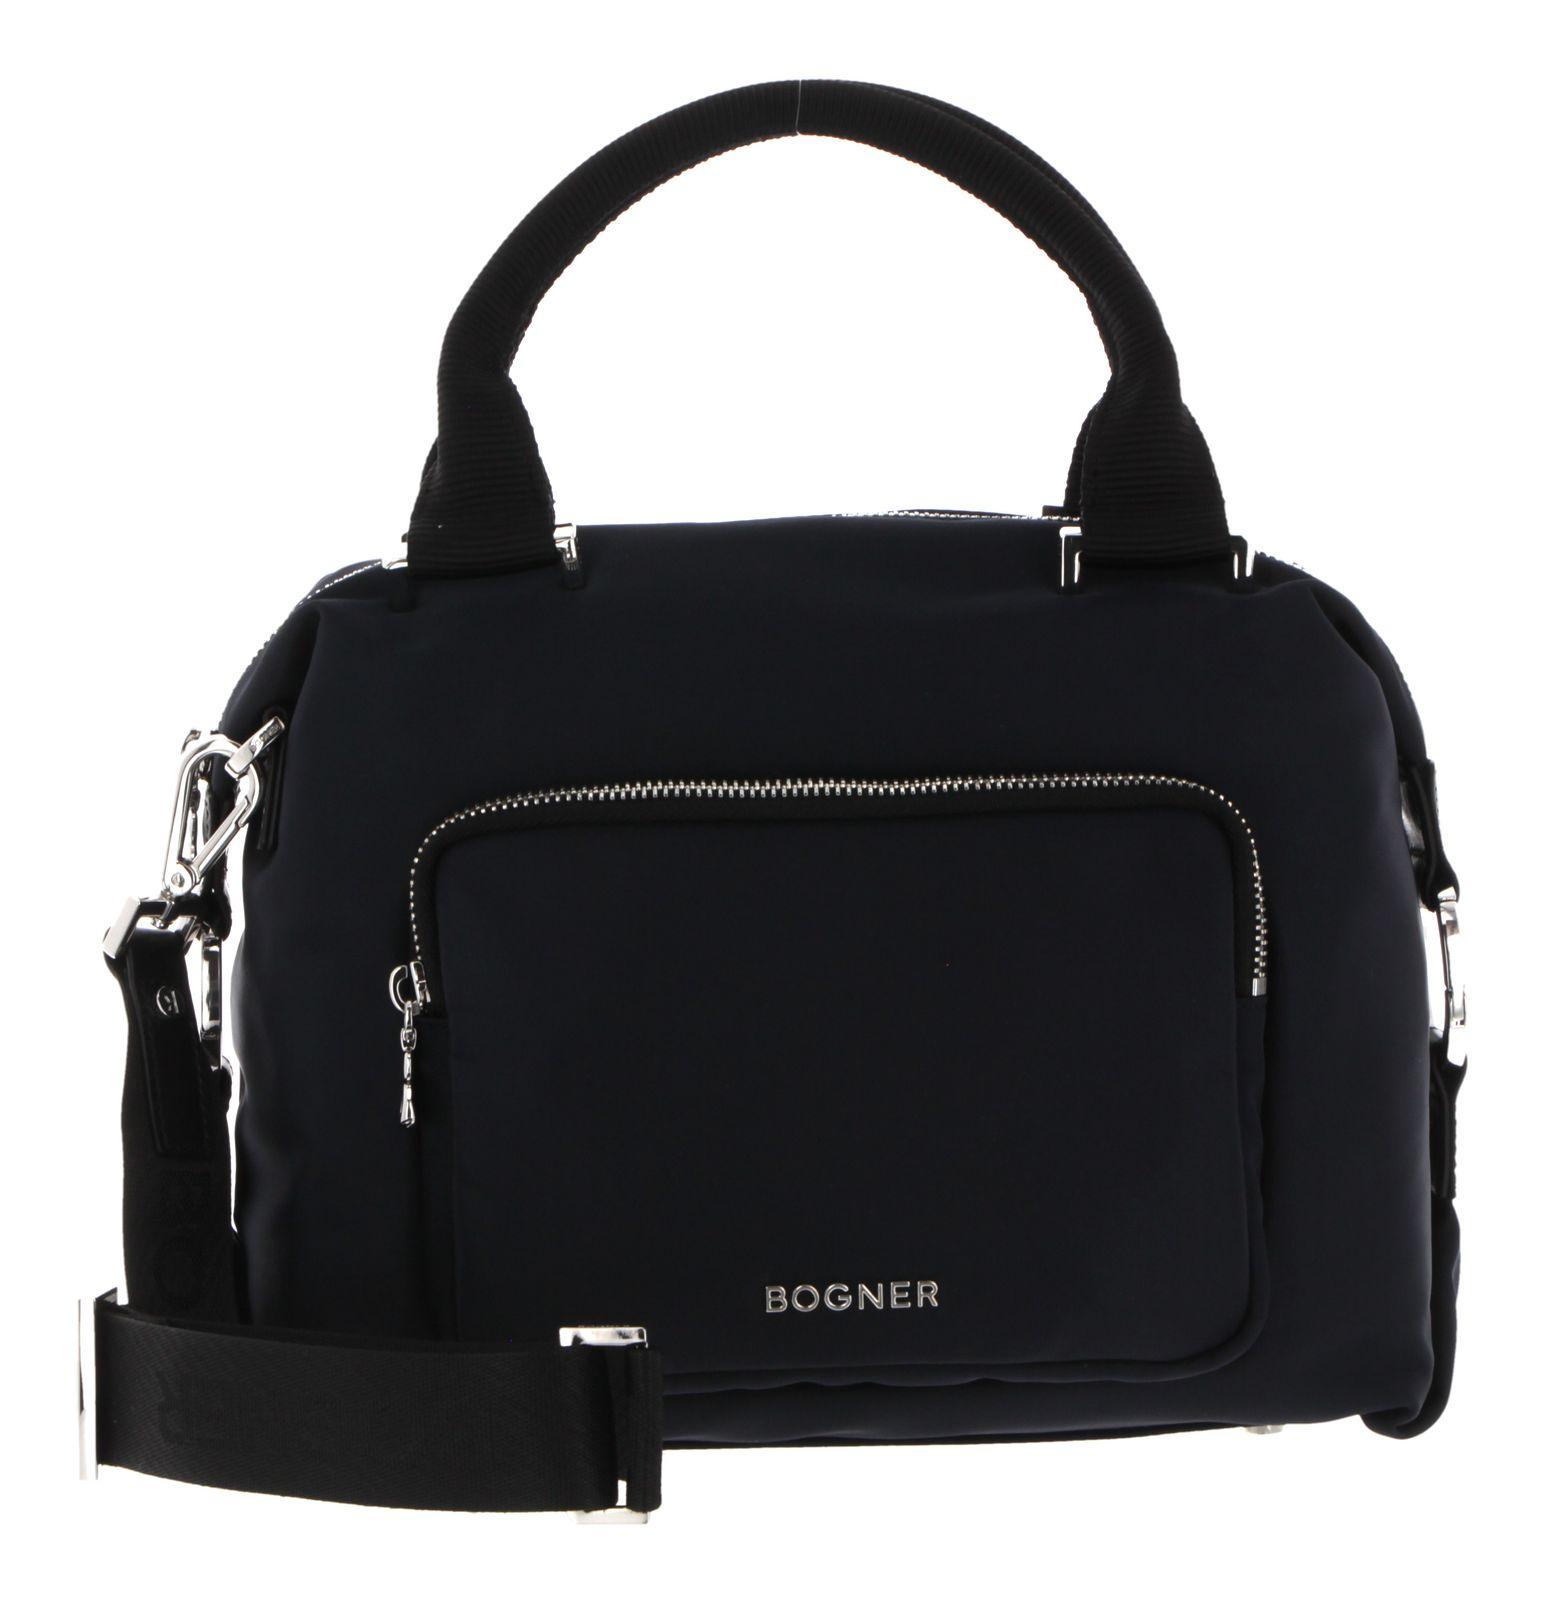 Bogner Klosters Sofie Handbag S Darkblue